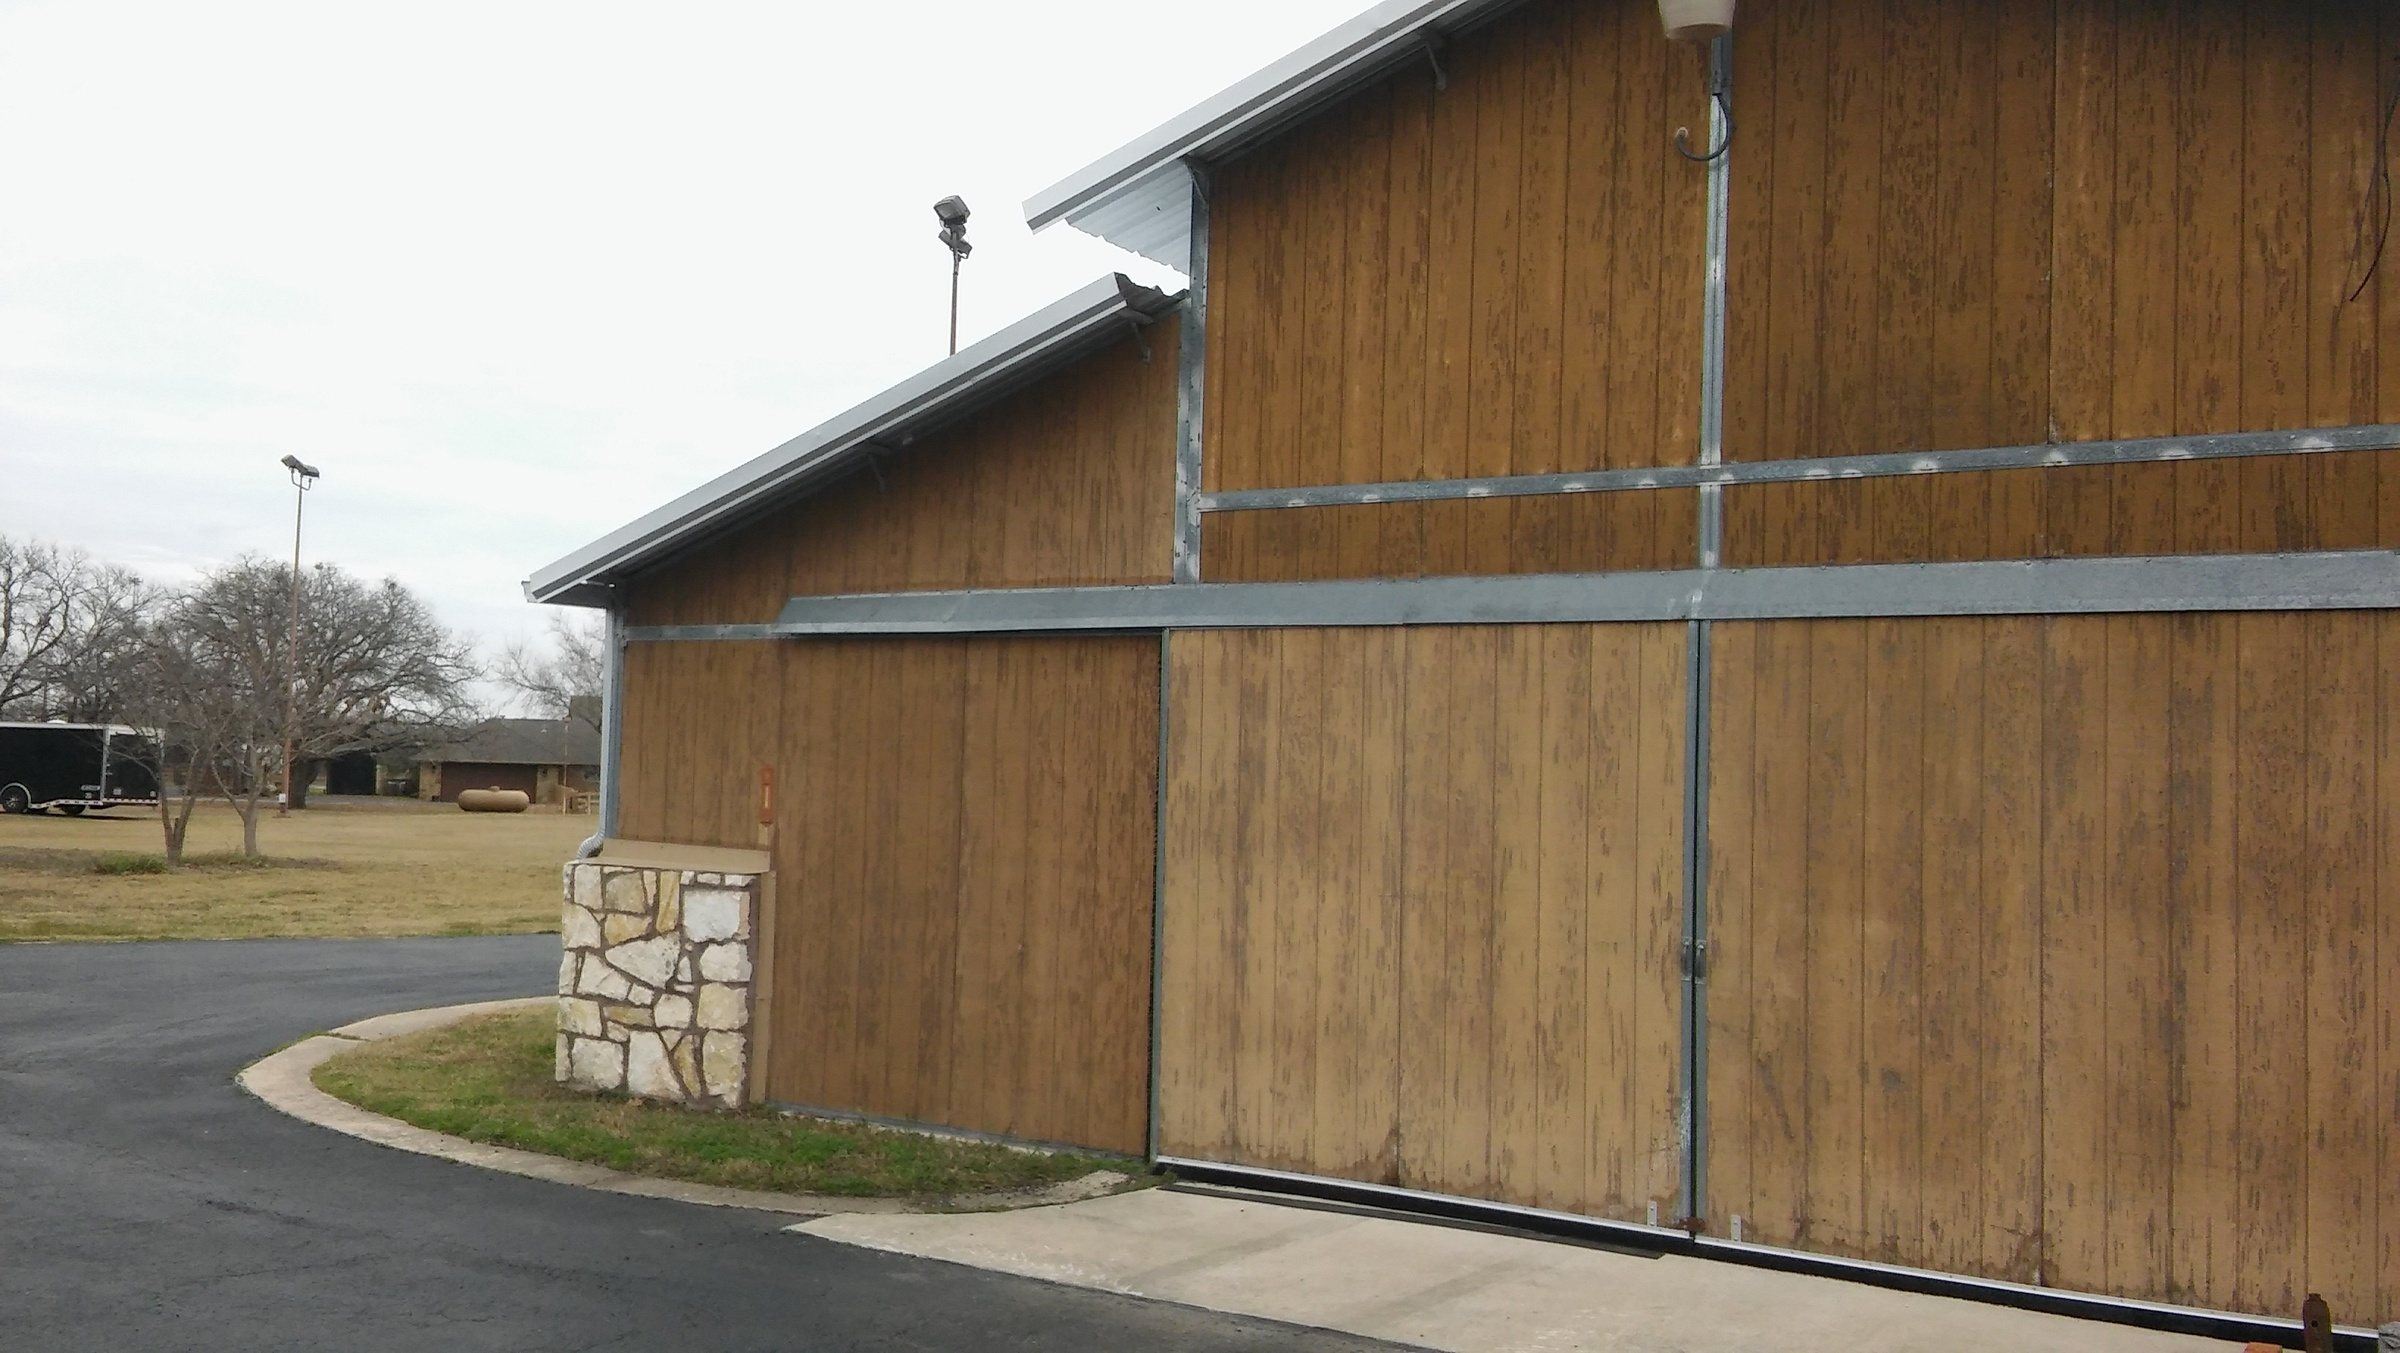 Sliding doors prior to metal barn refurbishment.